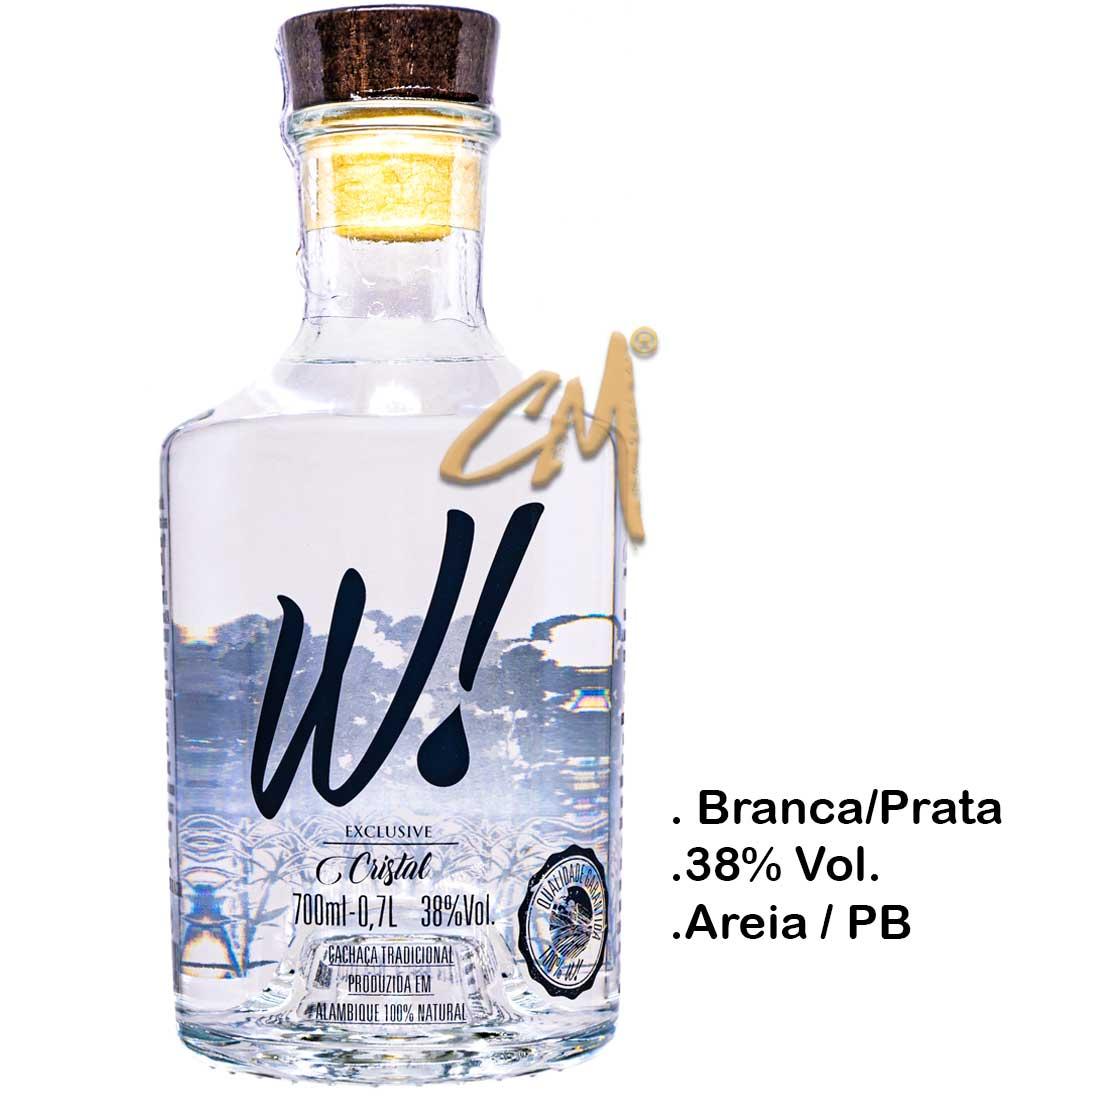 Cachaça W! Exclusive Cristal 700 ml (Areia - PB)